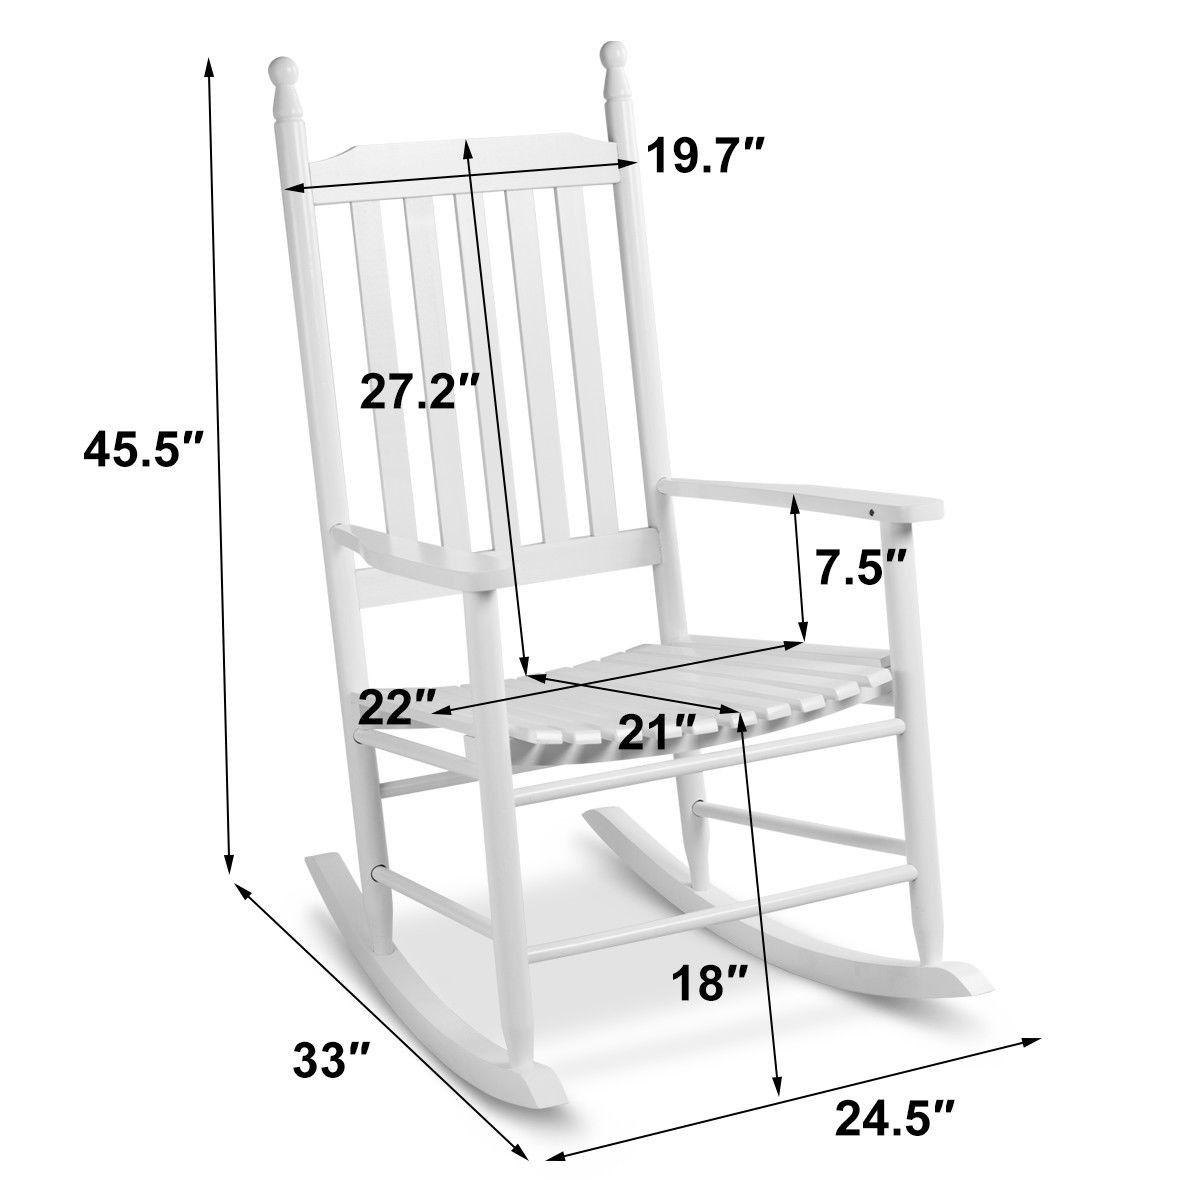 Wooden Balcony Deck Garden Porch, Deck Rocking Chair Plans